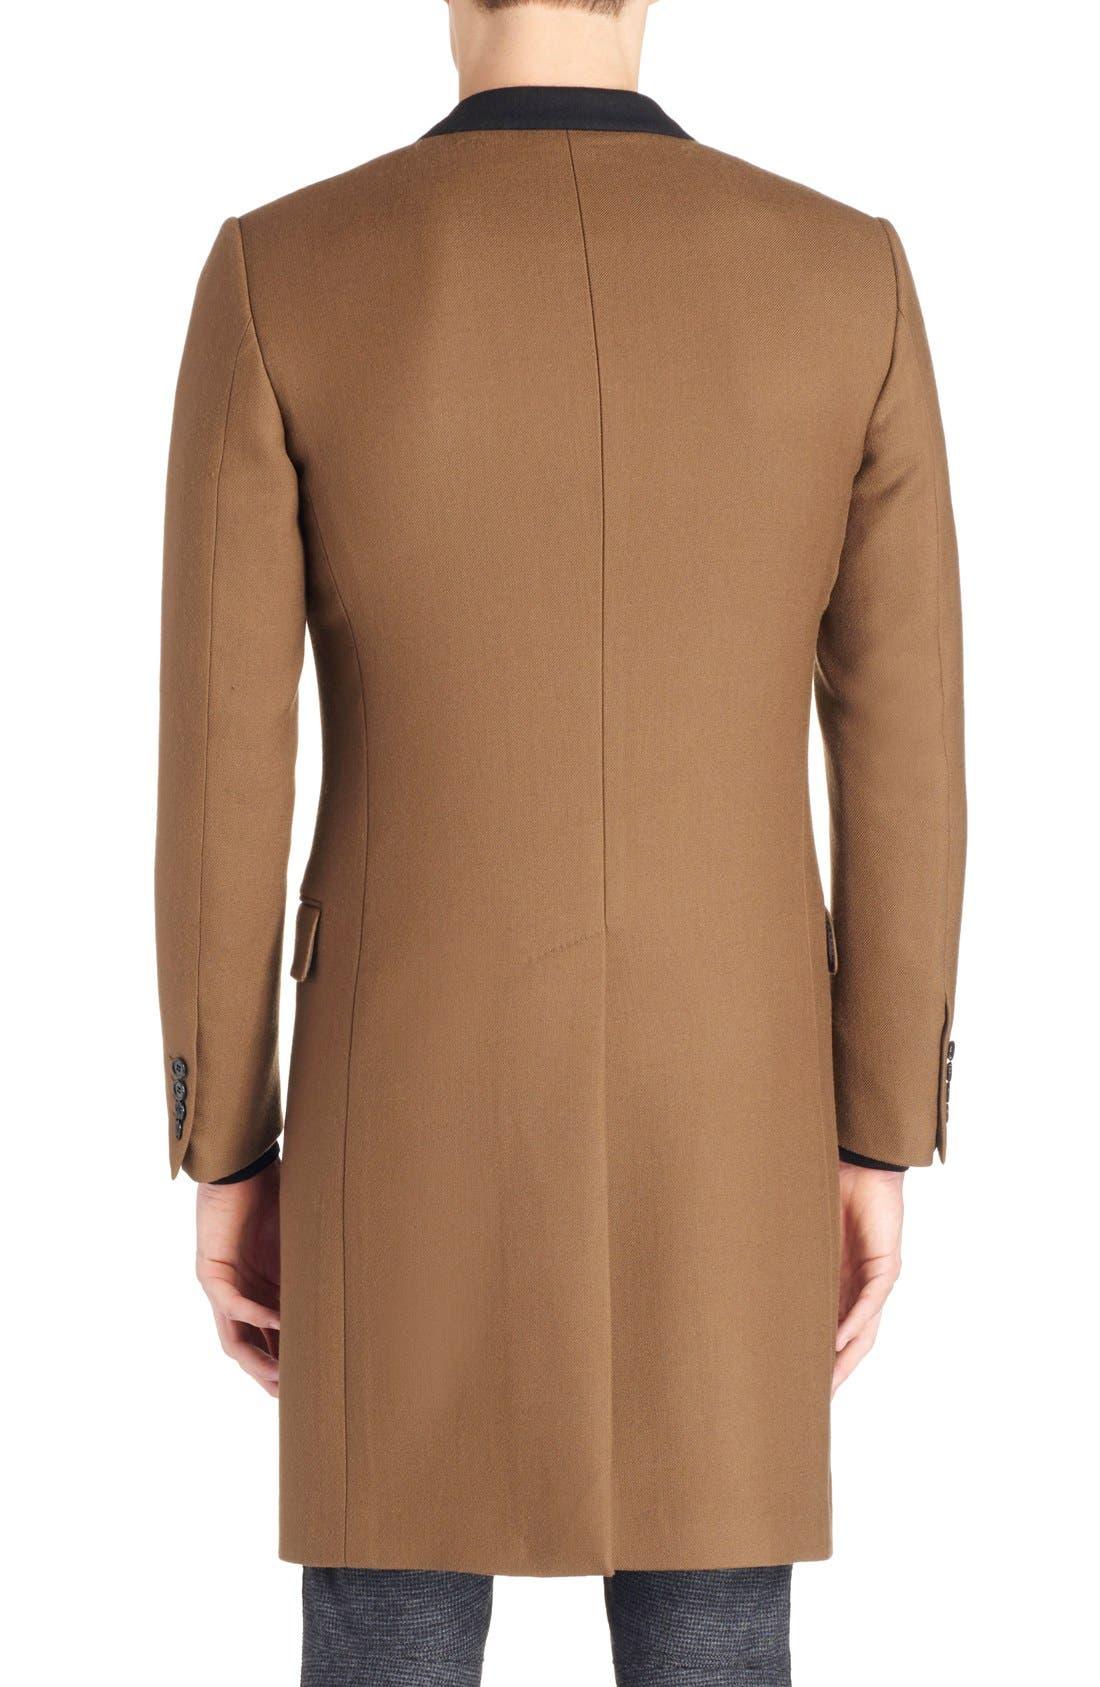 LANVIN, Wool Overcoat, Alternate thumbnail 6, color, 230